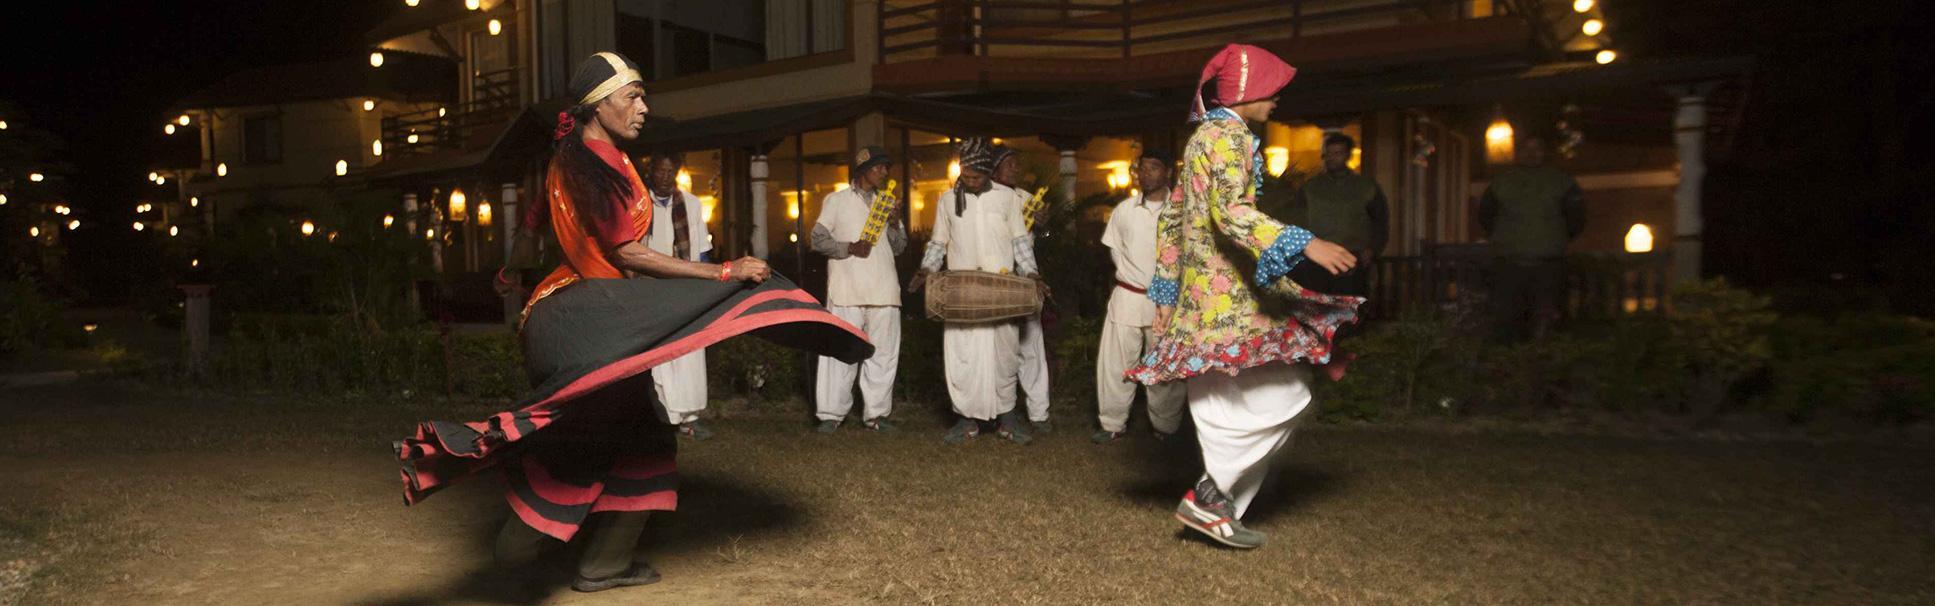 Tharu cultural program in chitwanr